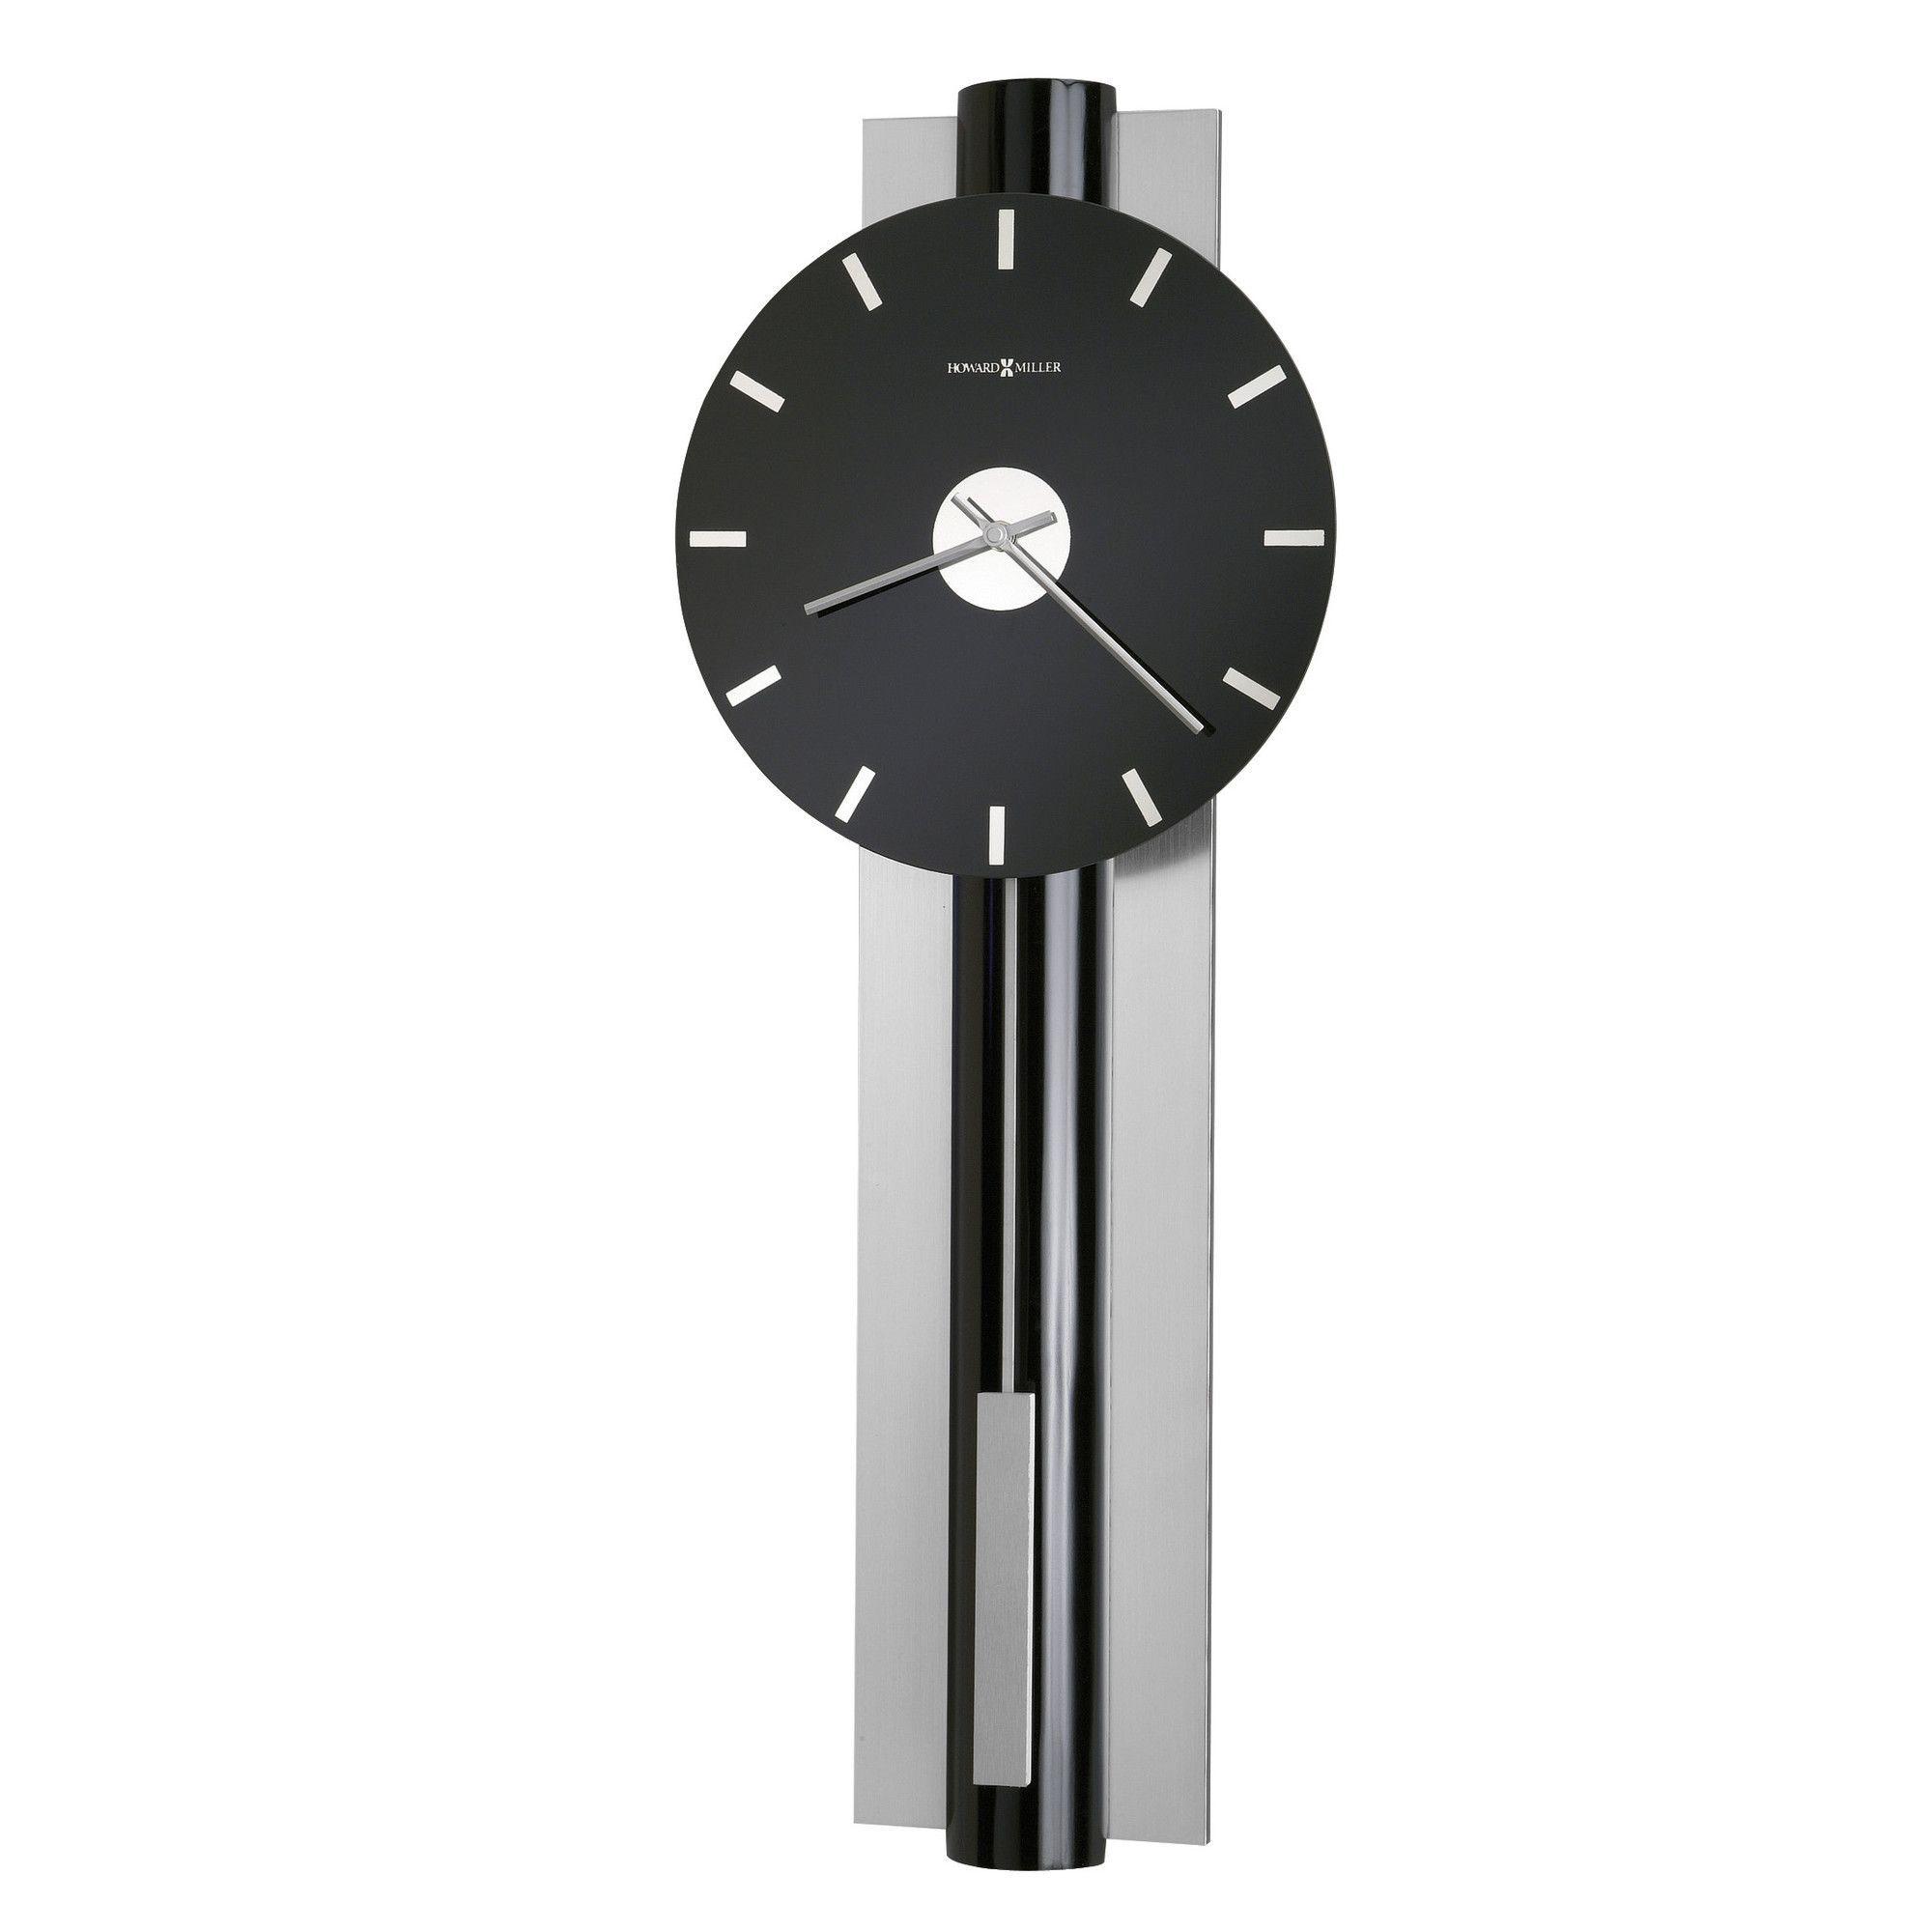 Hudson Quartz Wall Clock My Future House Pinterest Wall Clocks